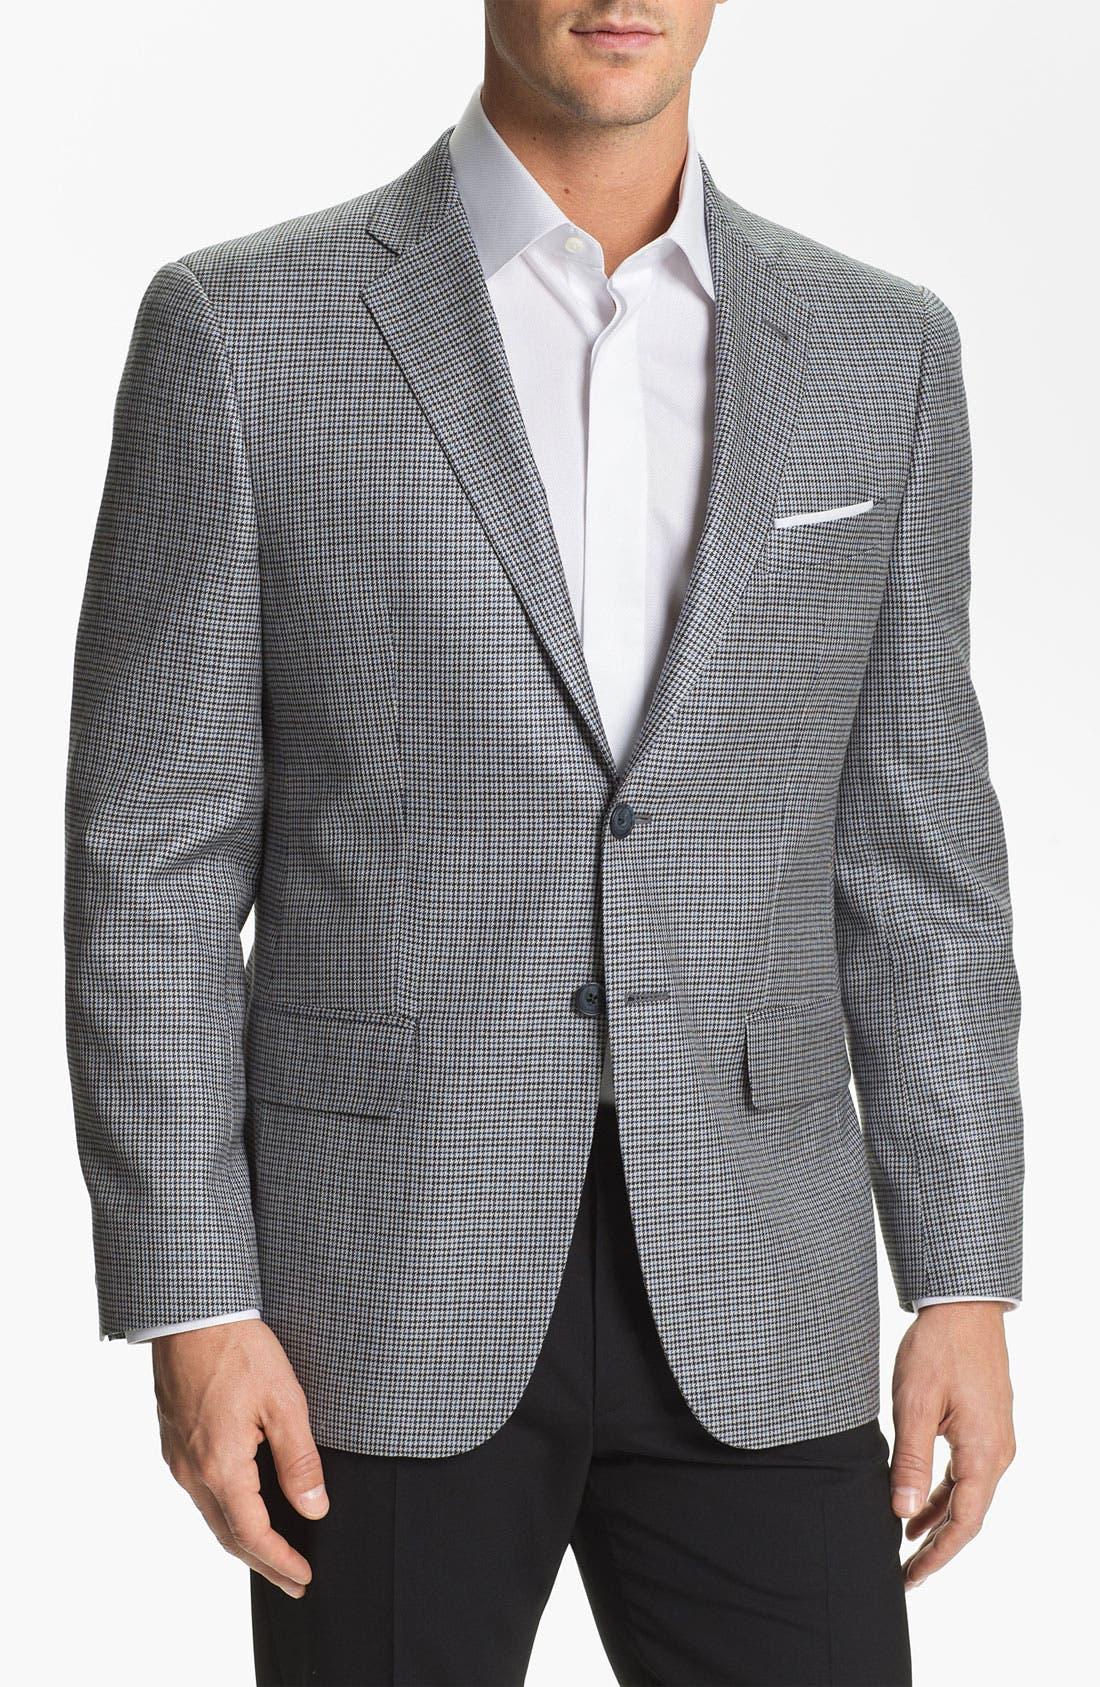 Alternate Image 1 Selected - Joseph Abboud 'Profile' Trim Fit Check Sportcoat